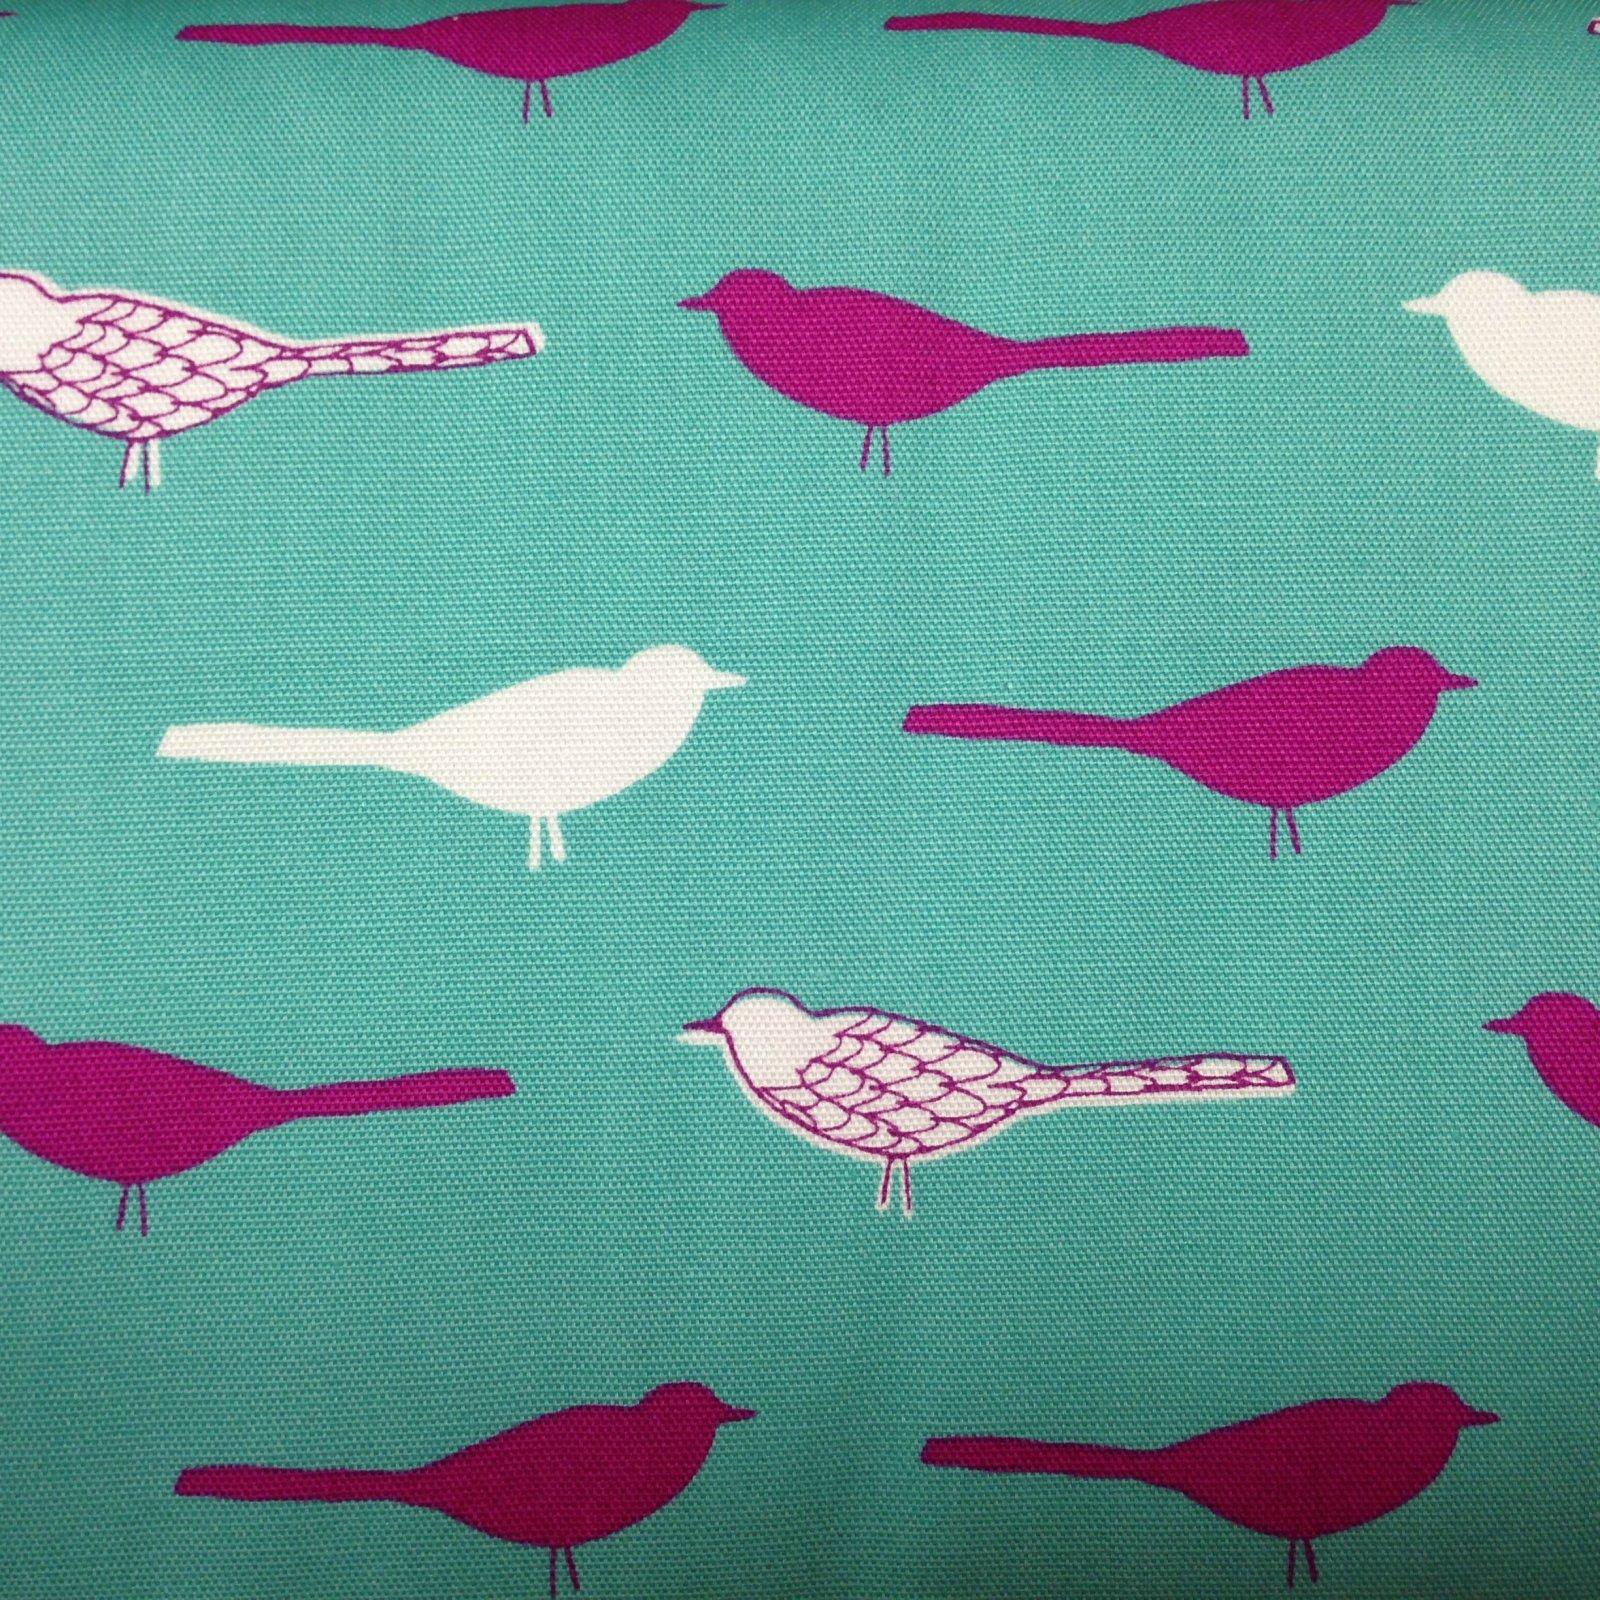 Oxford Canas - Birds - Teal